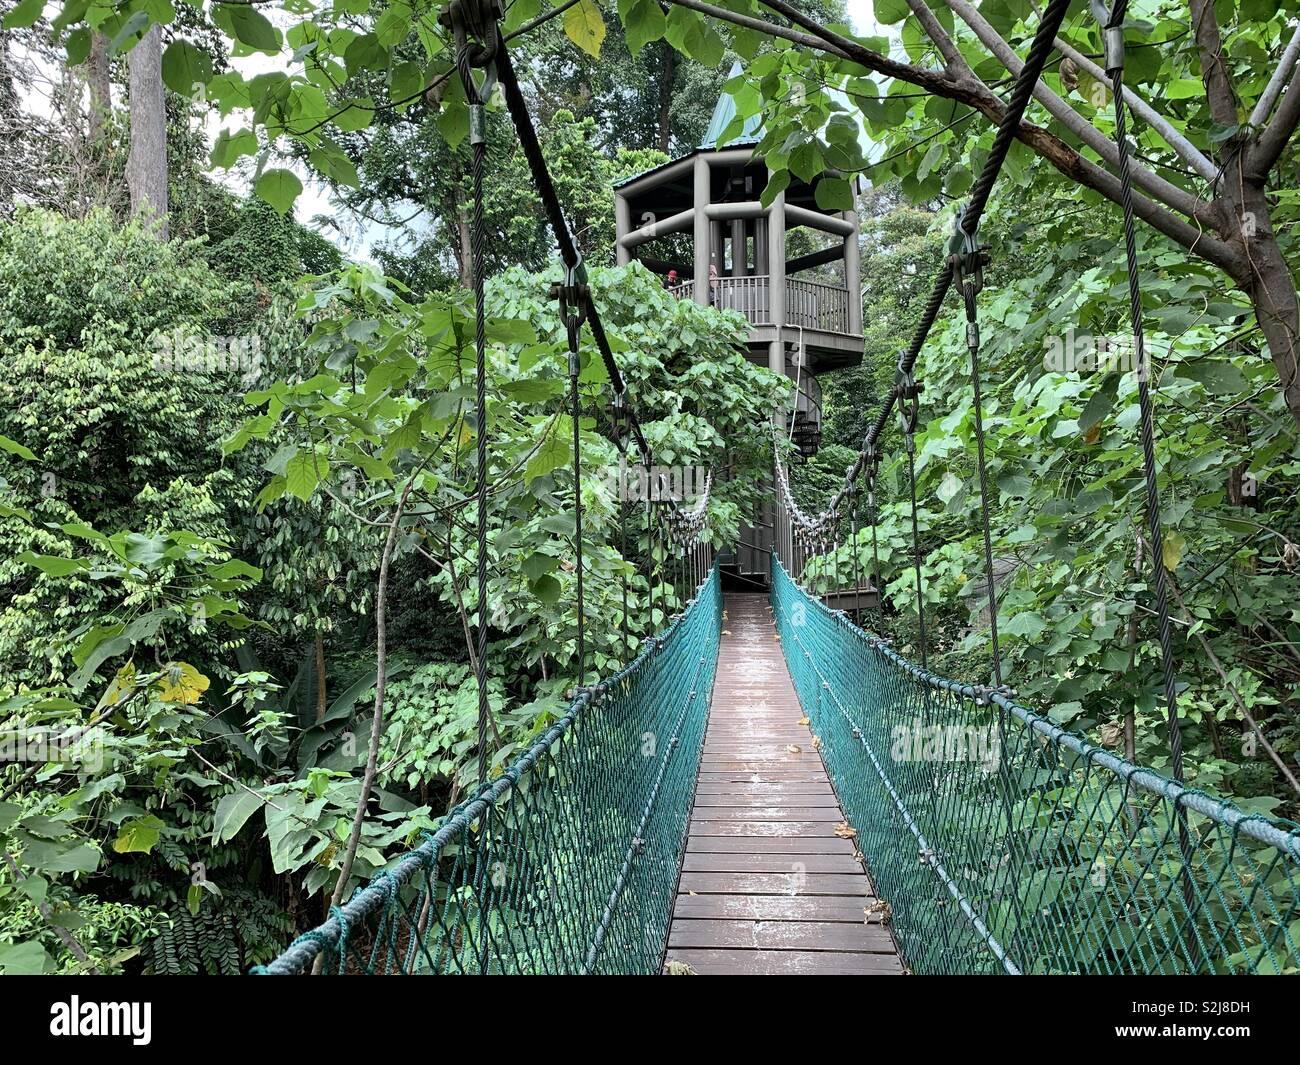 Canopy walk in the jungle Stock Photo